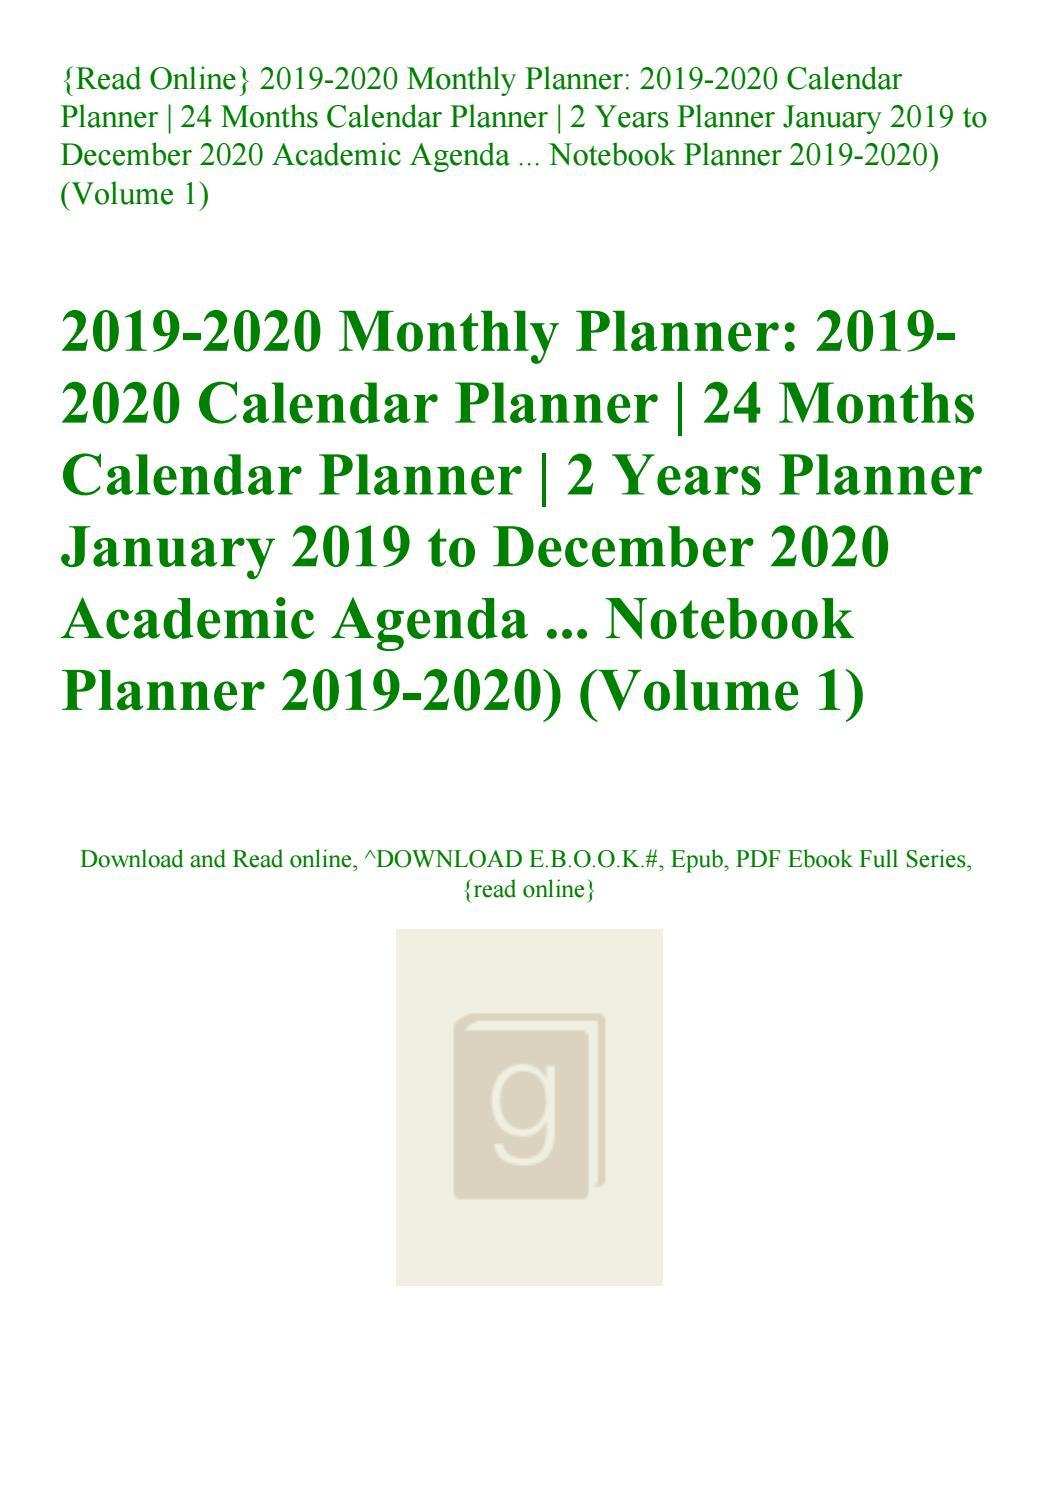 Read Online} 2019-2020 Monthly Planner 2019-2020 Calendar Planner 24